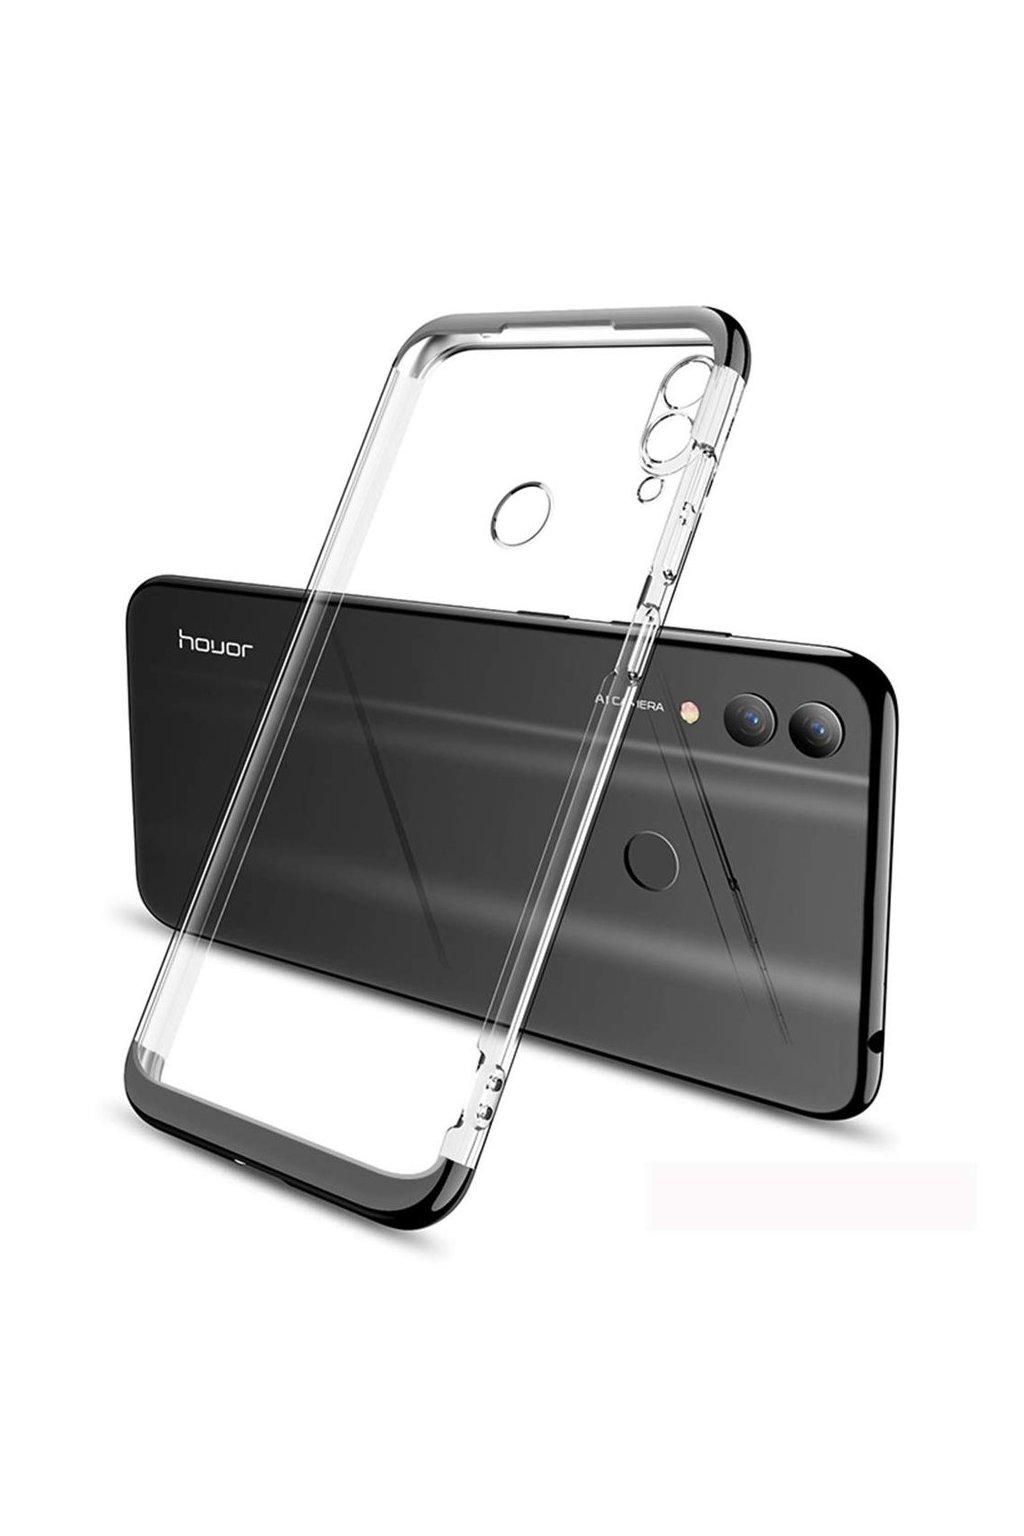 eng pl GKK 360 Phantom Case Front and Back transparent Case Full Body Cover Huawei P Smart 2019 black 49745 1